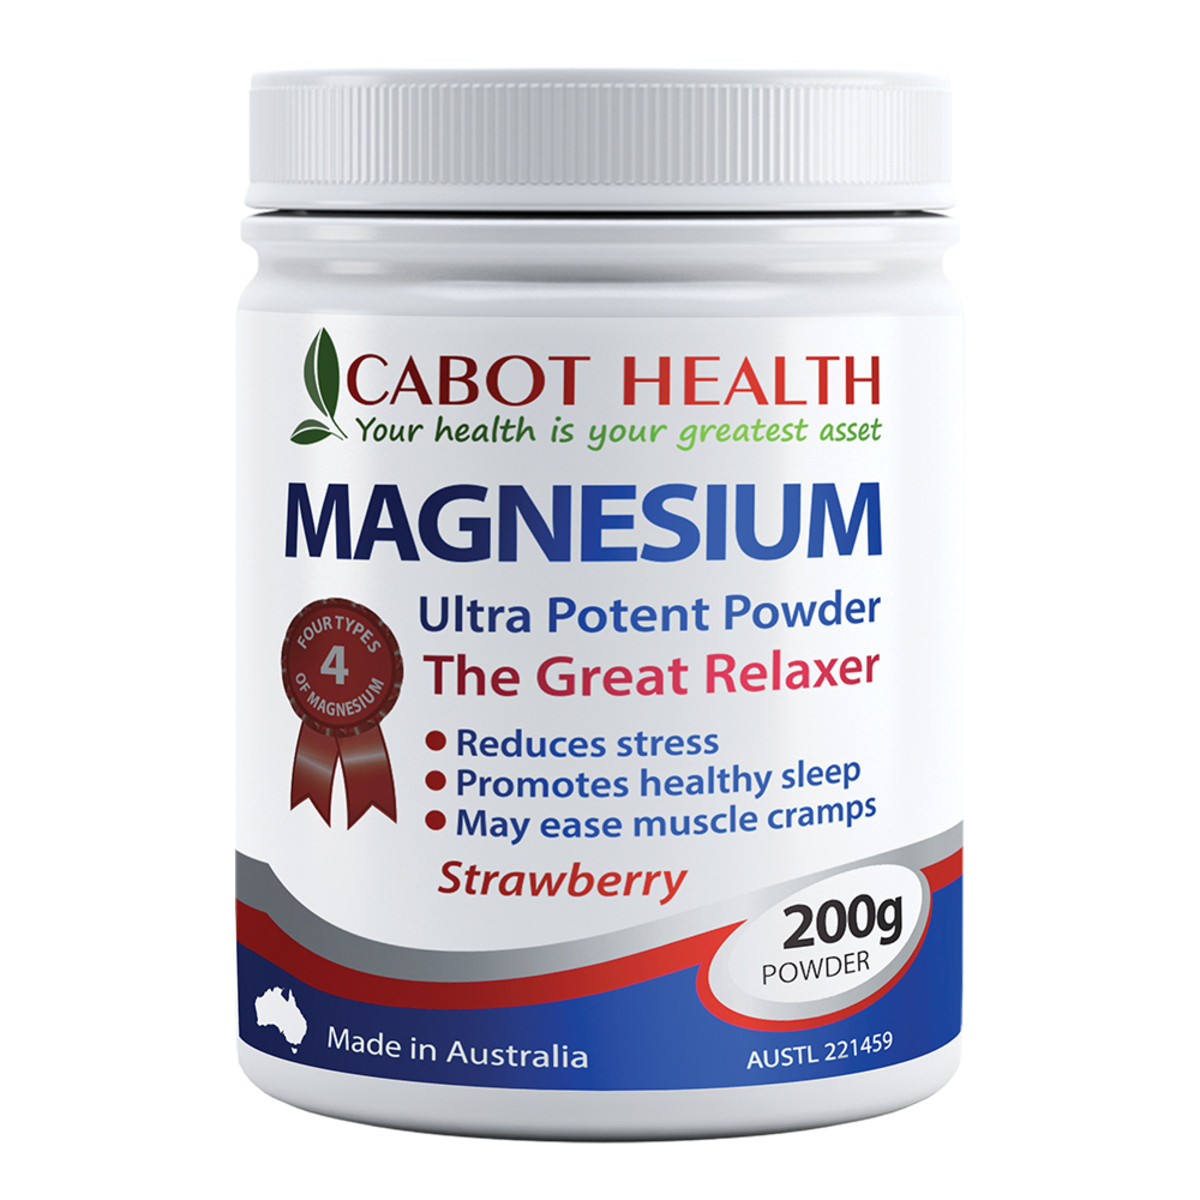 Cabot Health Magnesium Ultra Potent Strawberry Powder 200g_media-01